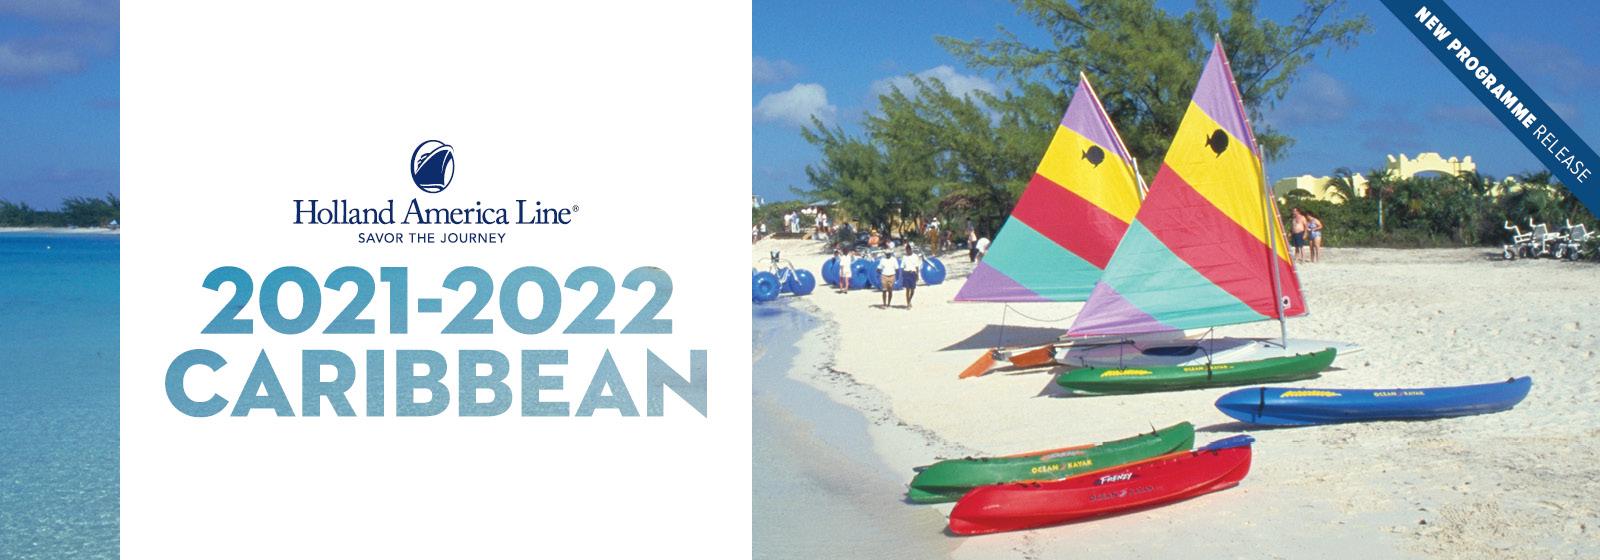 hal-caribbean-21-22